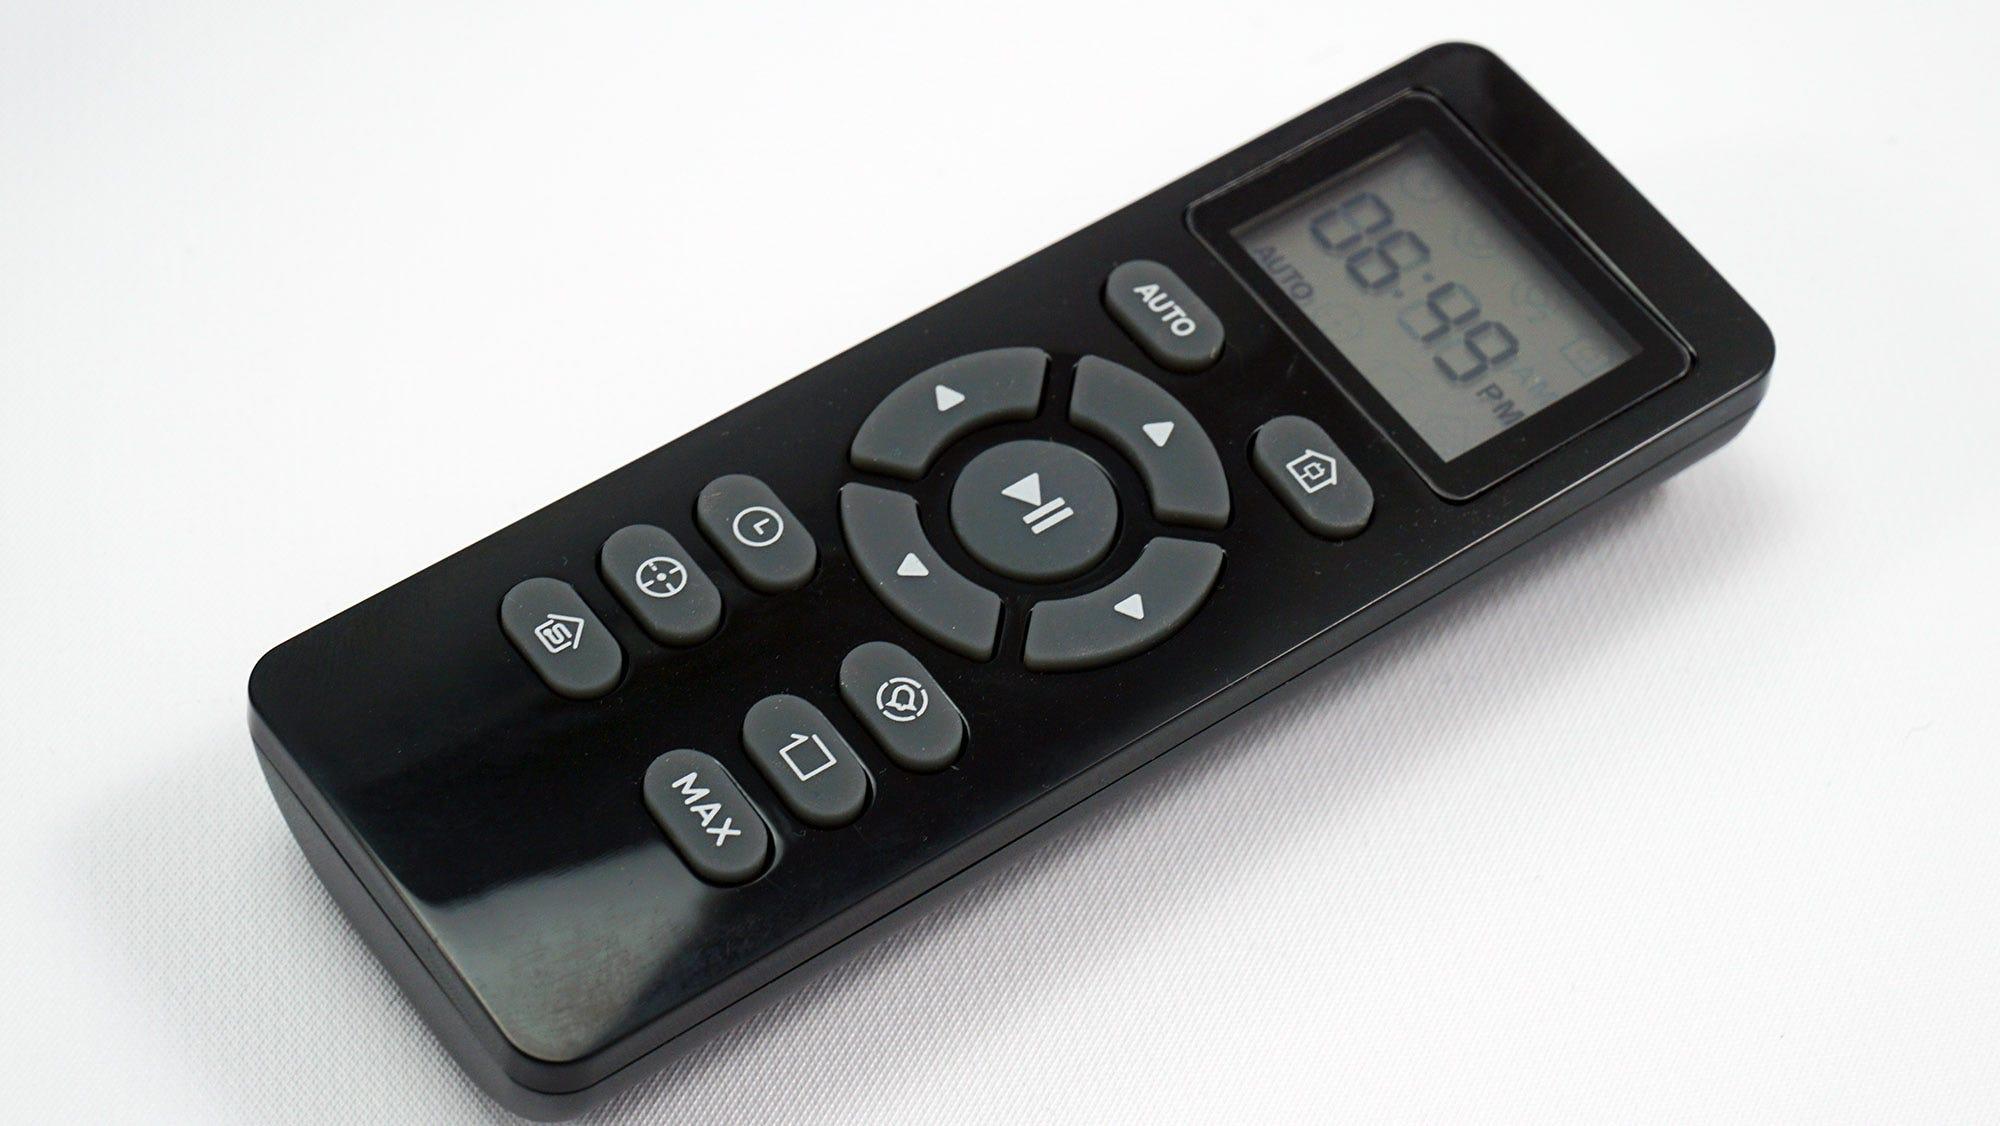 the BG600 remote.